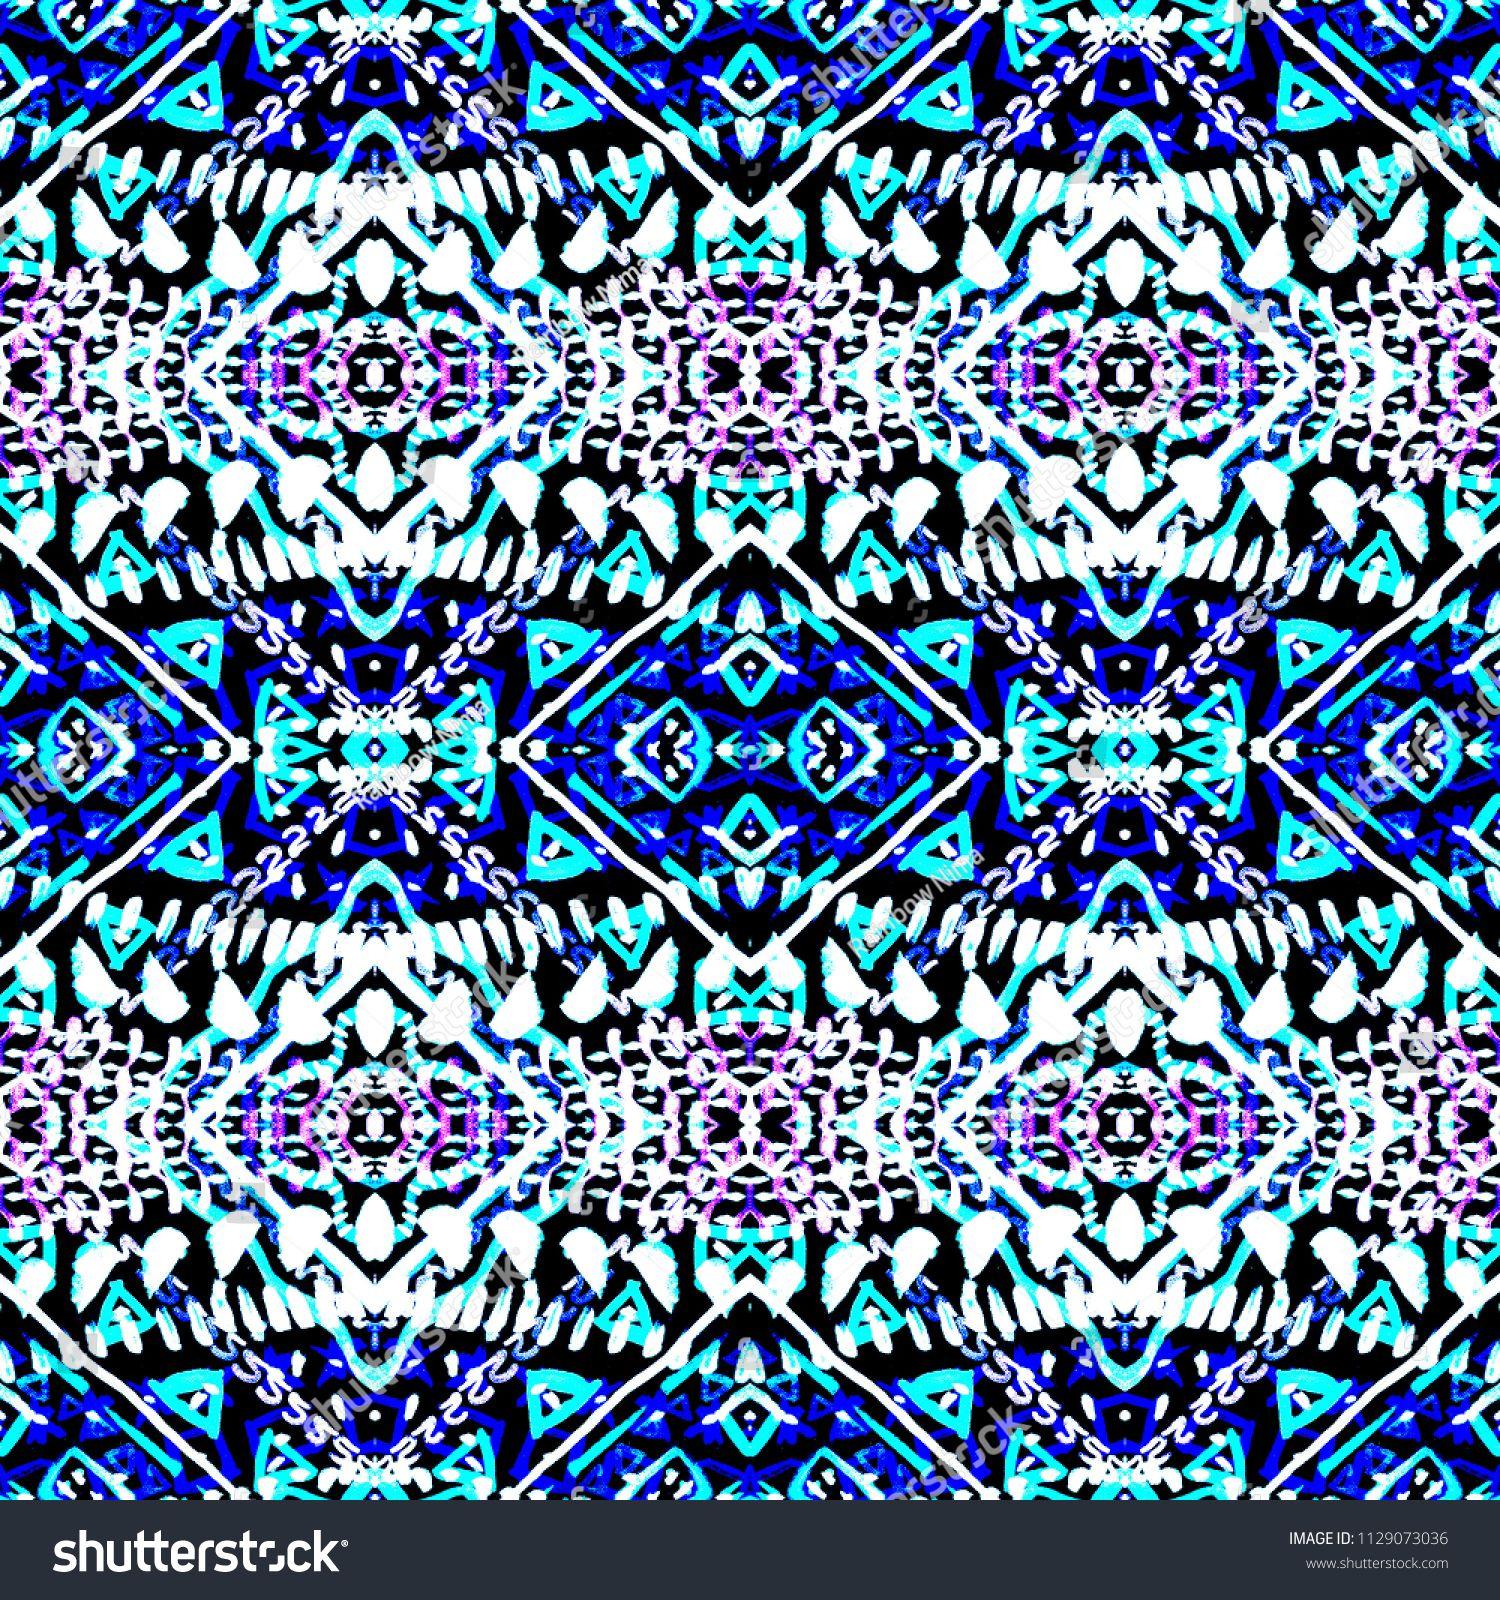 59bd14ff Tie dye indigo shibori print. Seamless hand drawn boho pattern. Ink  textured japanese background. Modern batik wallpaper tile. Watercolor  pattern for fabric ...